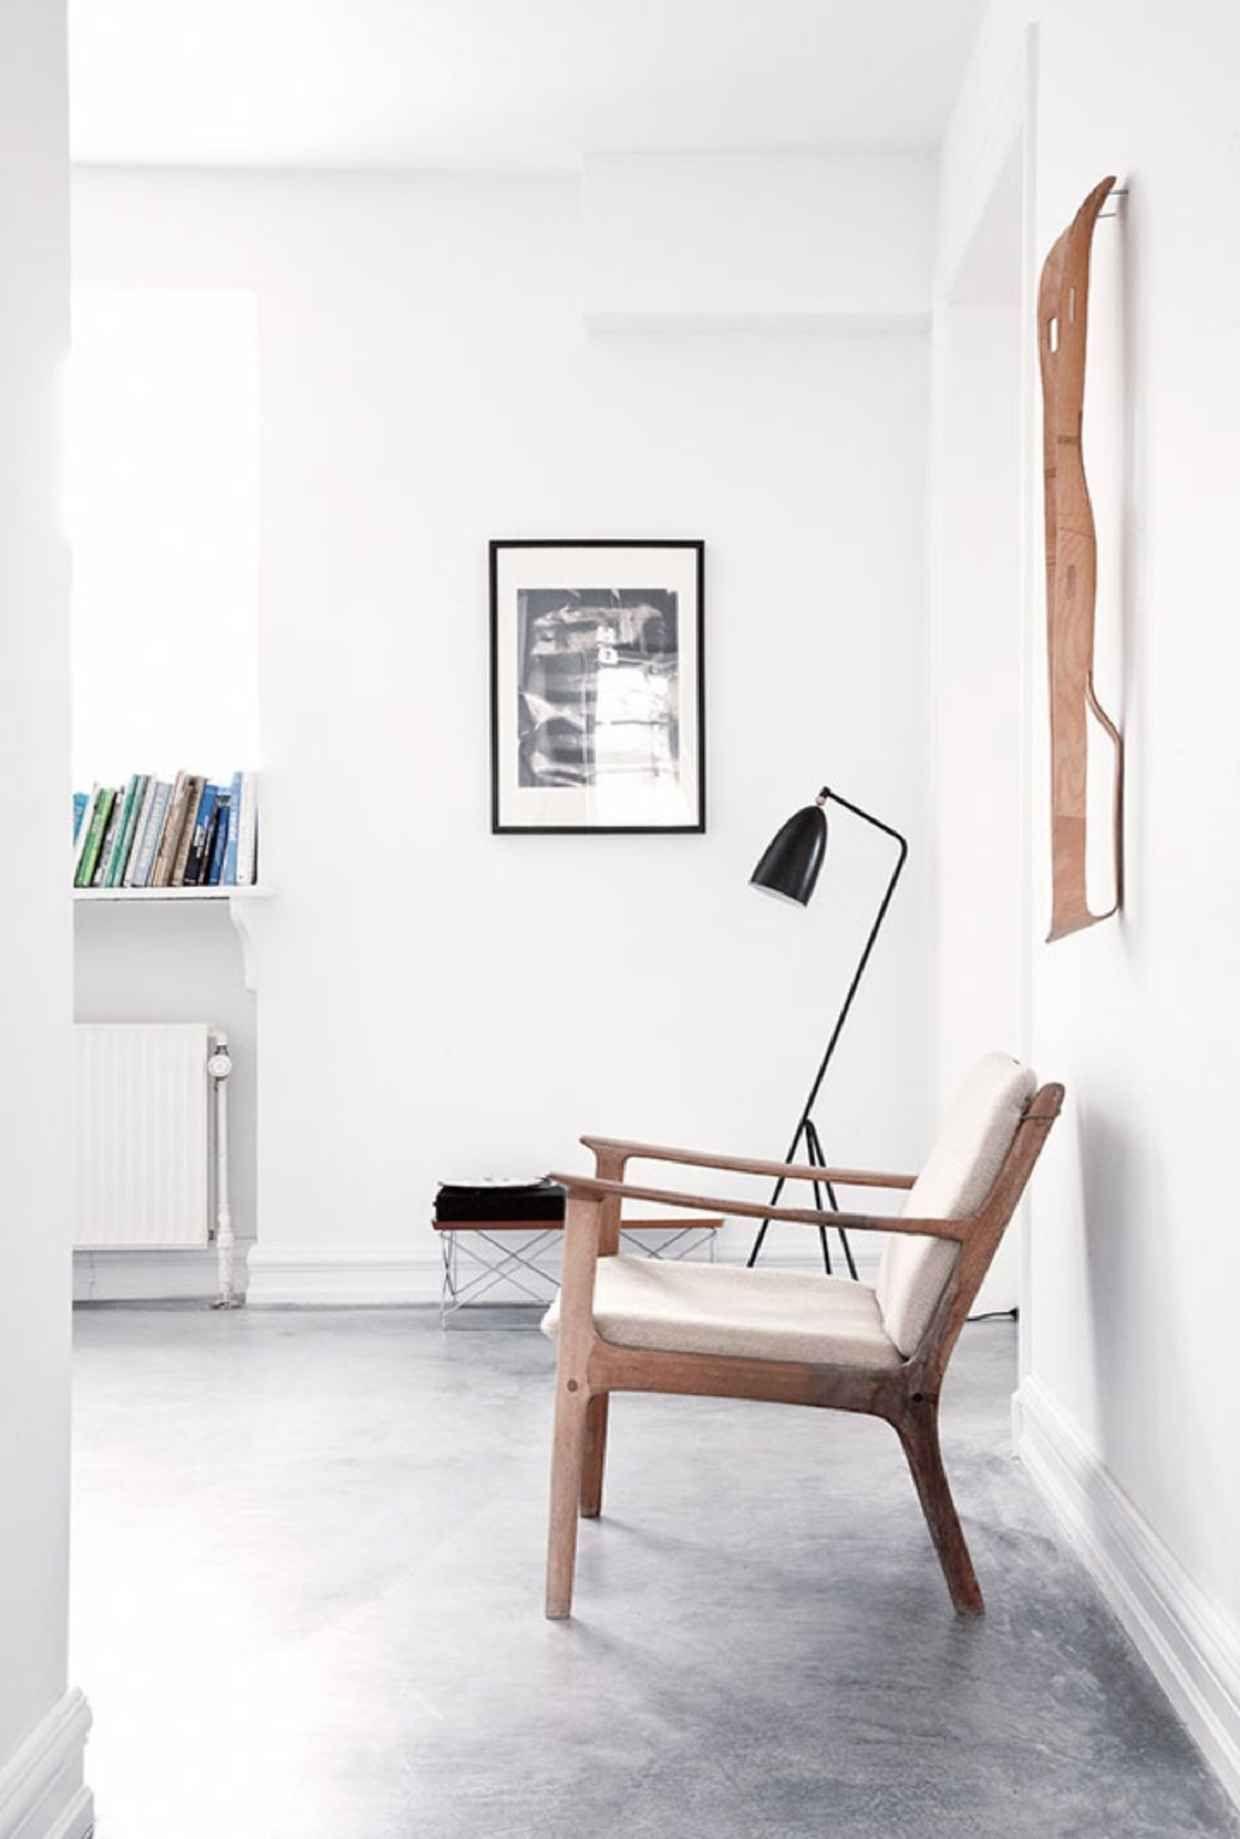 15 Examples Of Incredibly Minimal Interior Design Minimalism Interior Minimal Interior Design Interior Design Examples